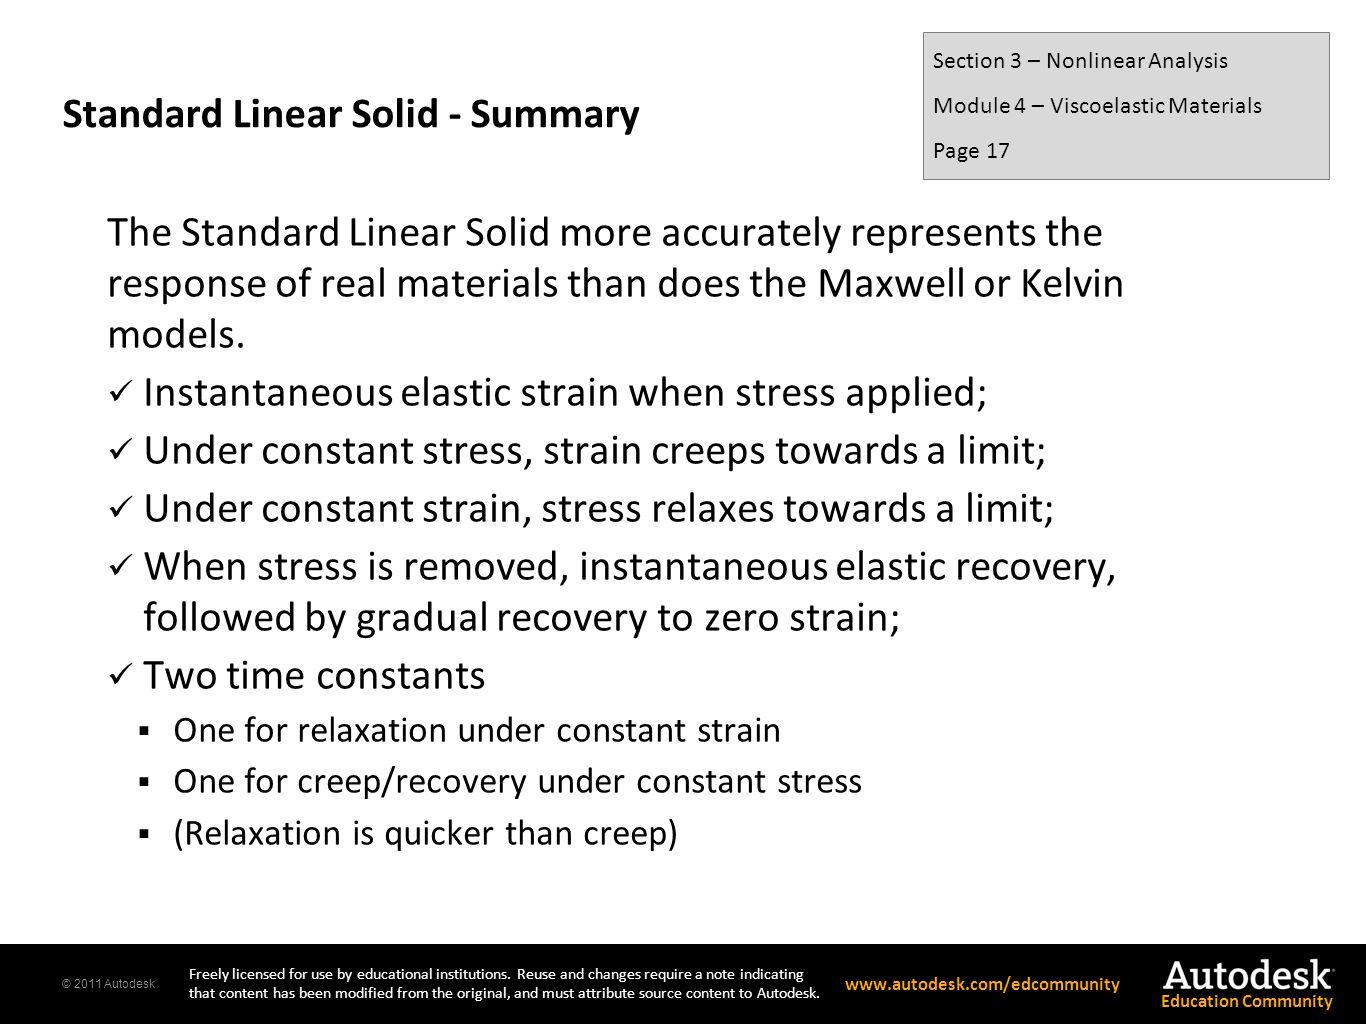 Standard Linear Solid - Summary